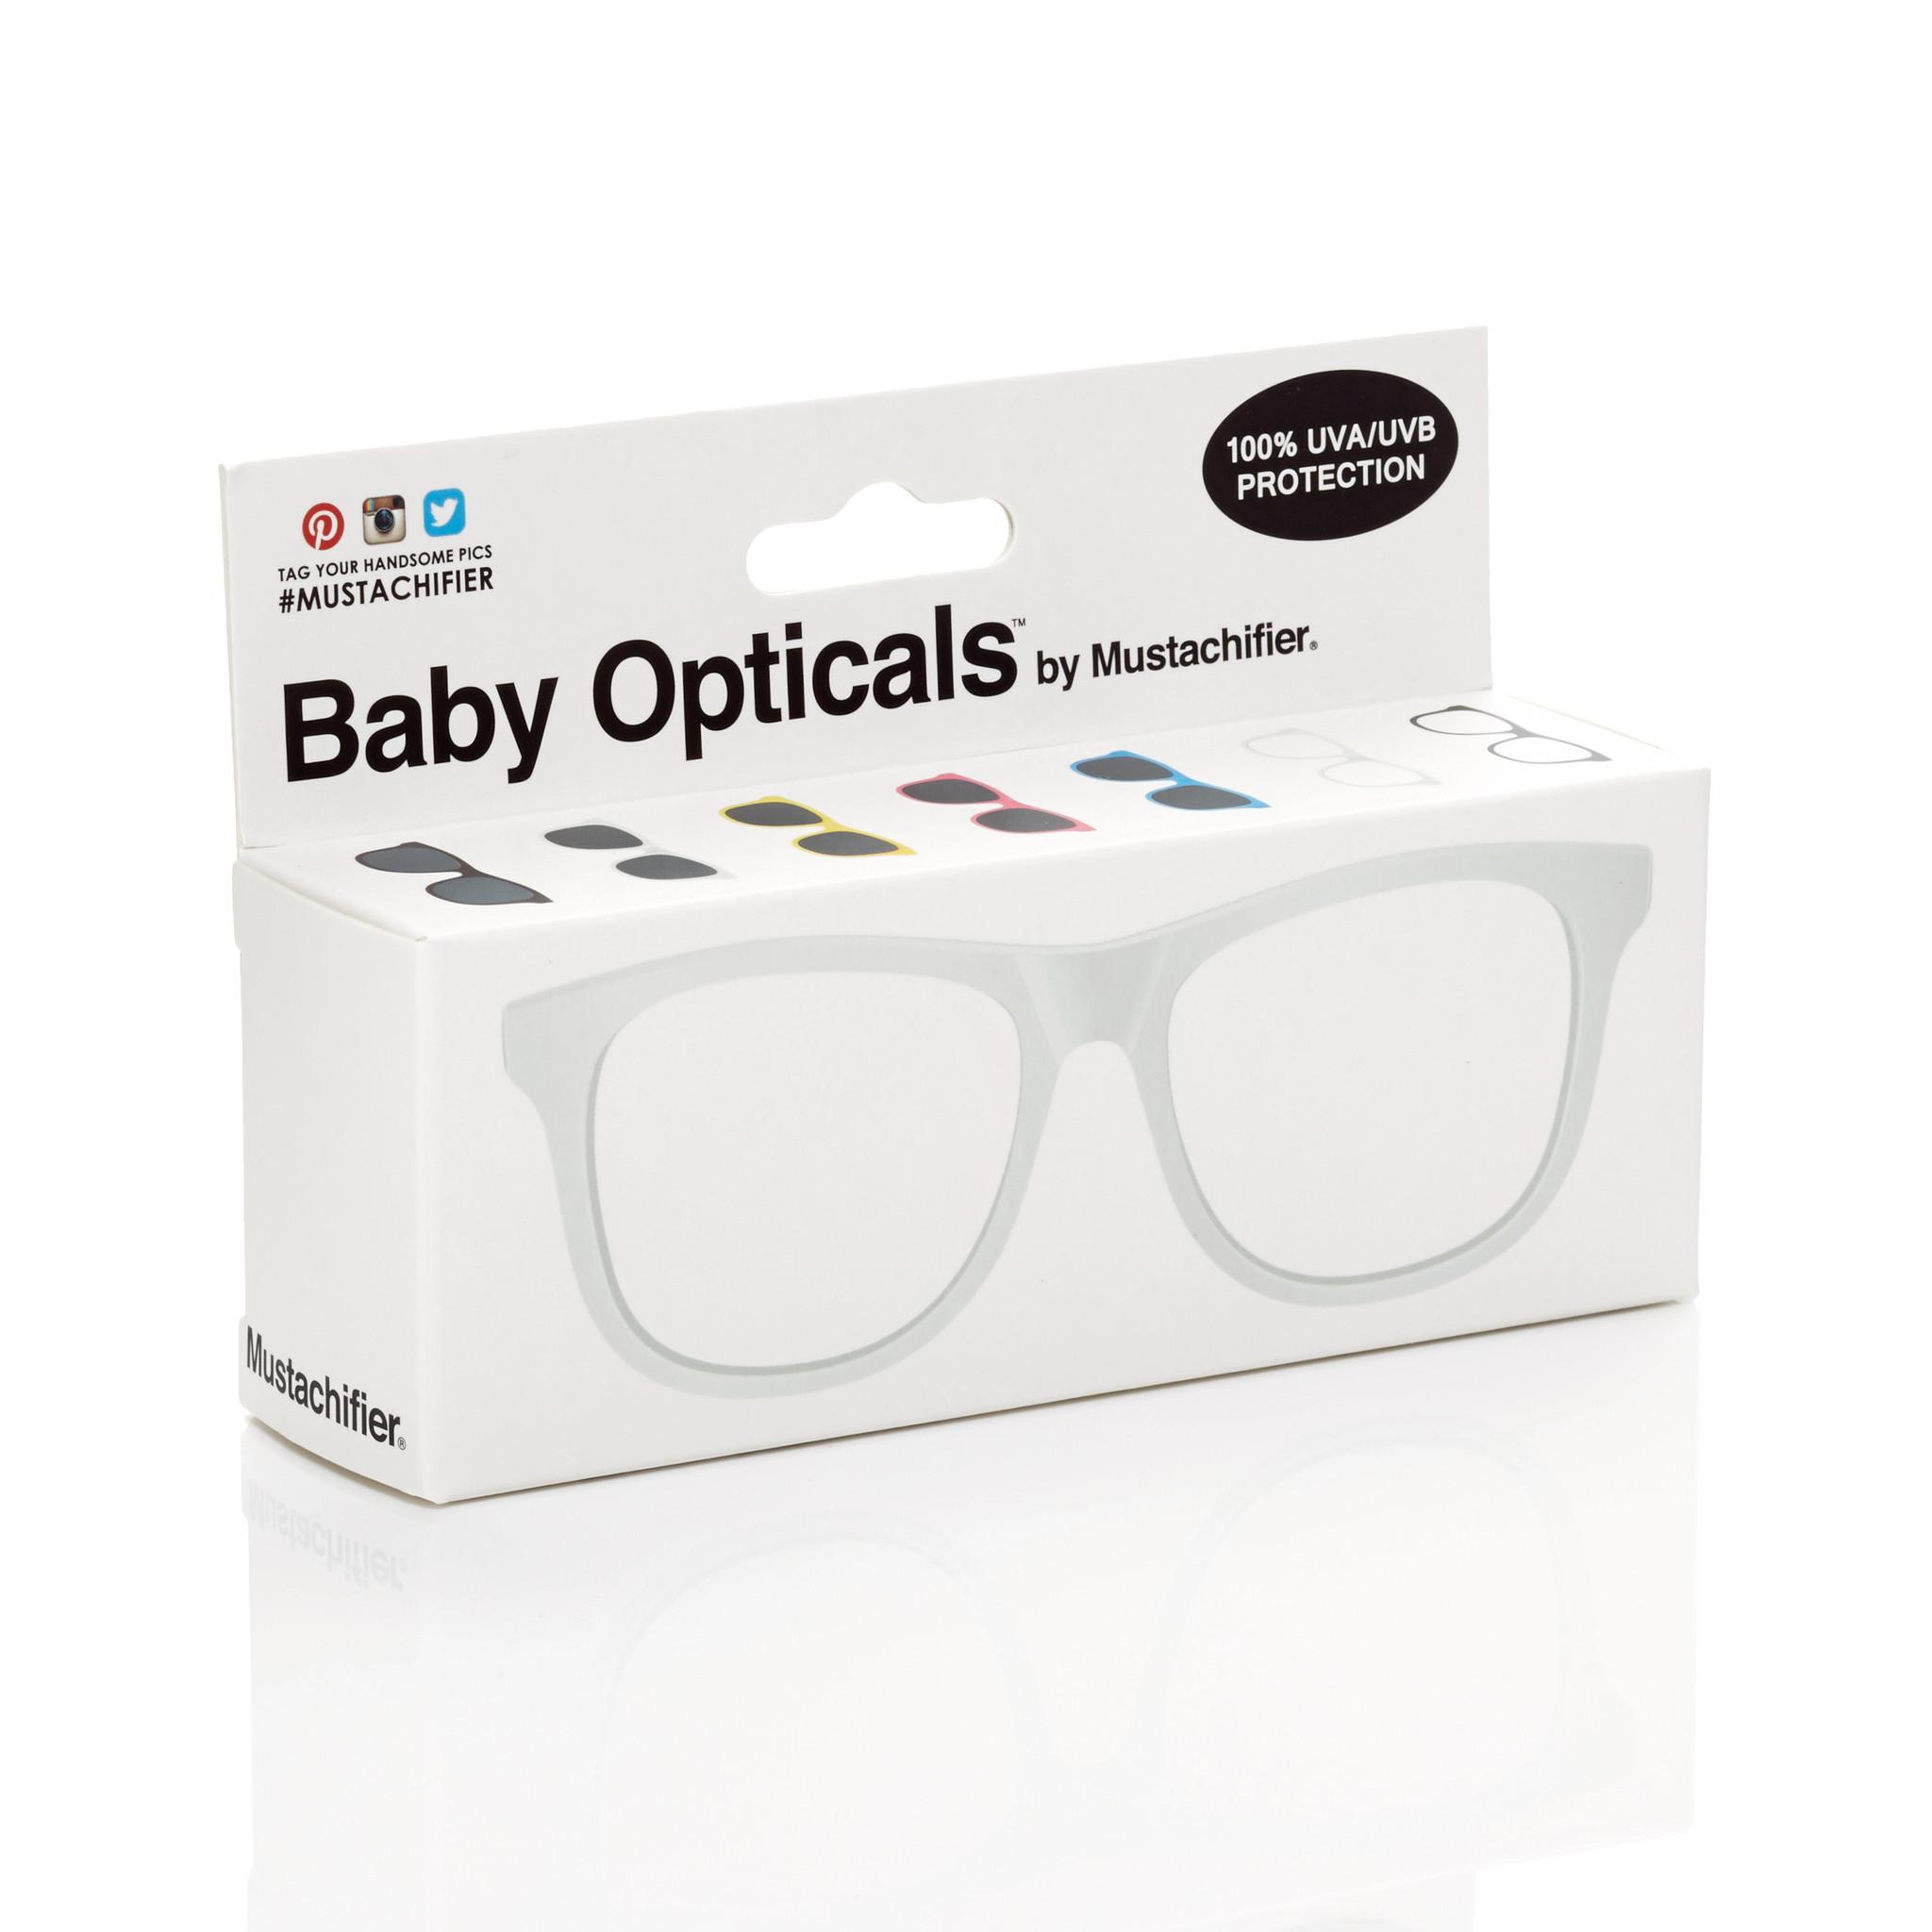 Mustachifier White UV Glasses Age 0-2 แว่นเนิร์ดเด็กสีขาว